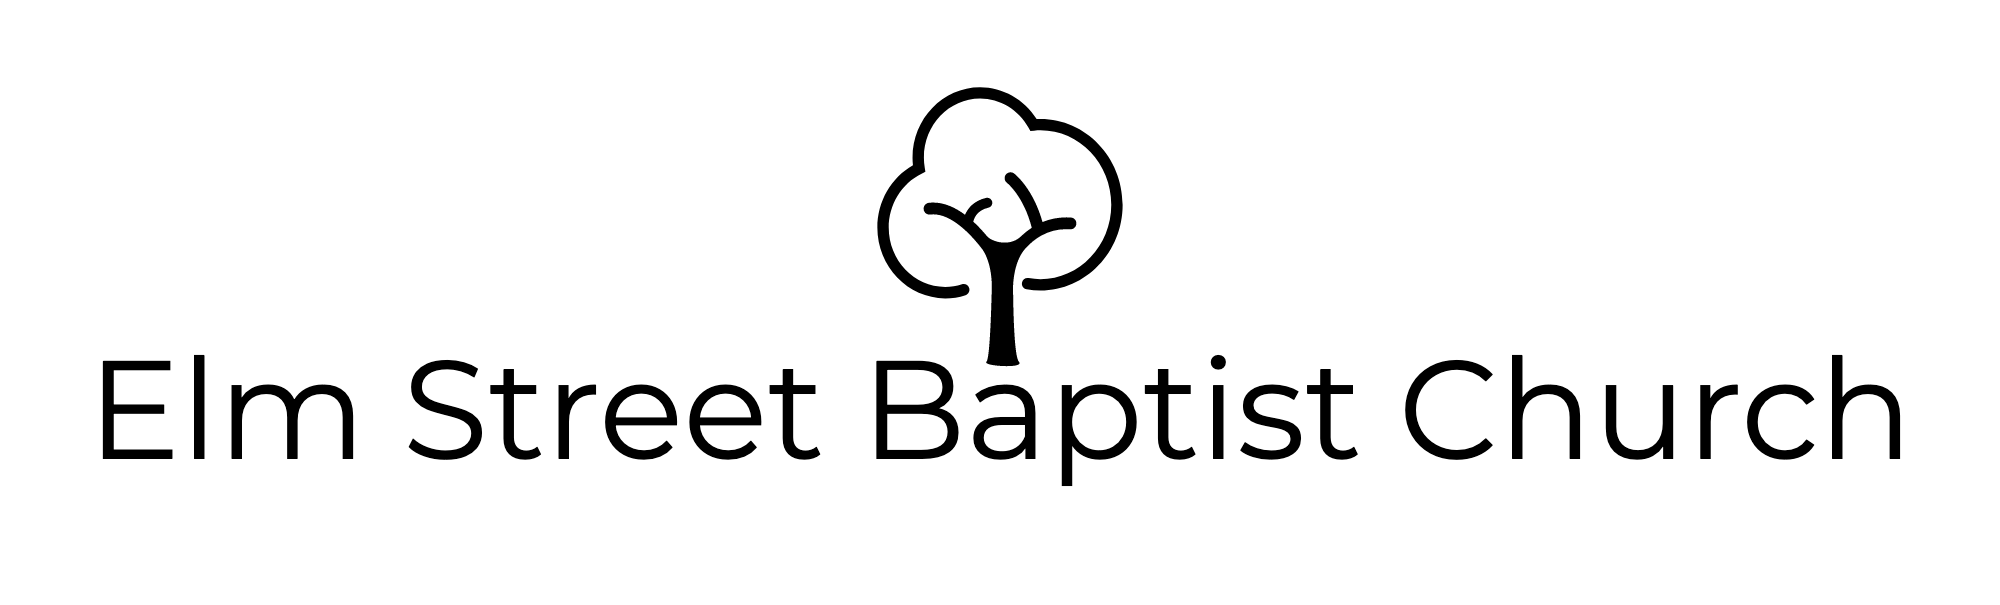 Elm Street Baptist Church-logo-black (1).png